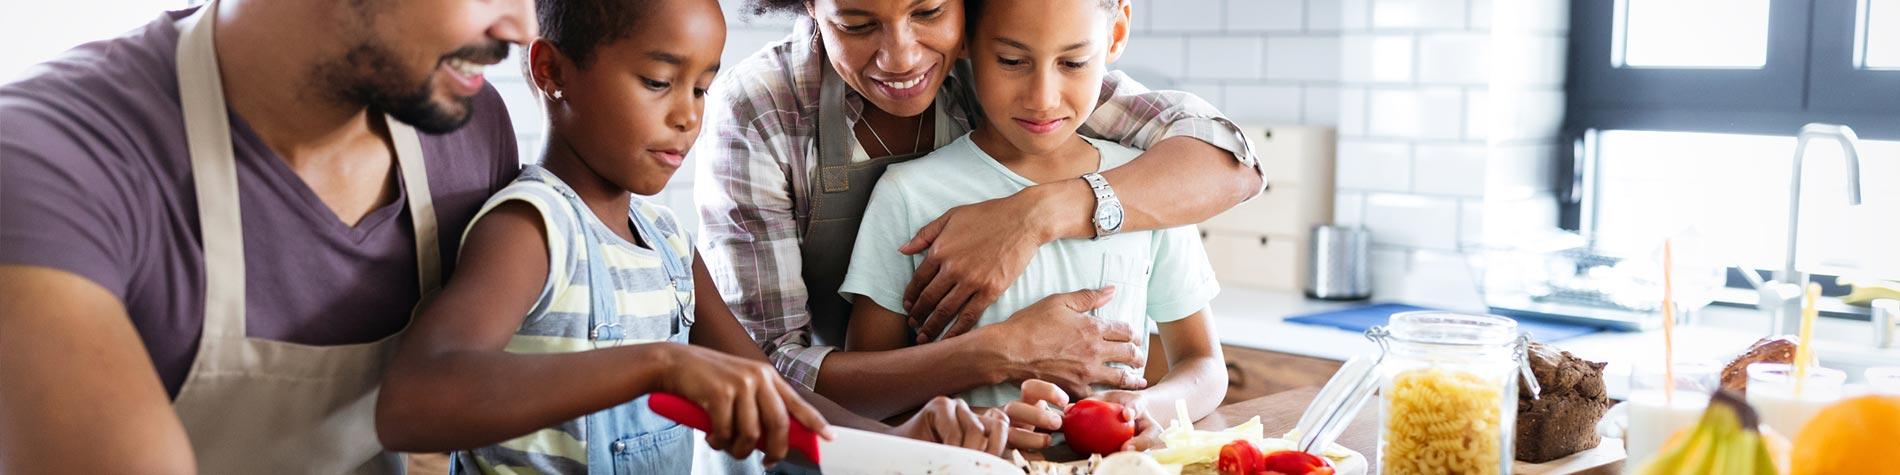 Behavior Change & Health Outcomes